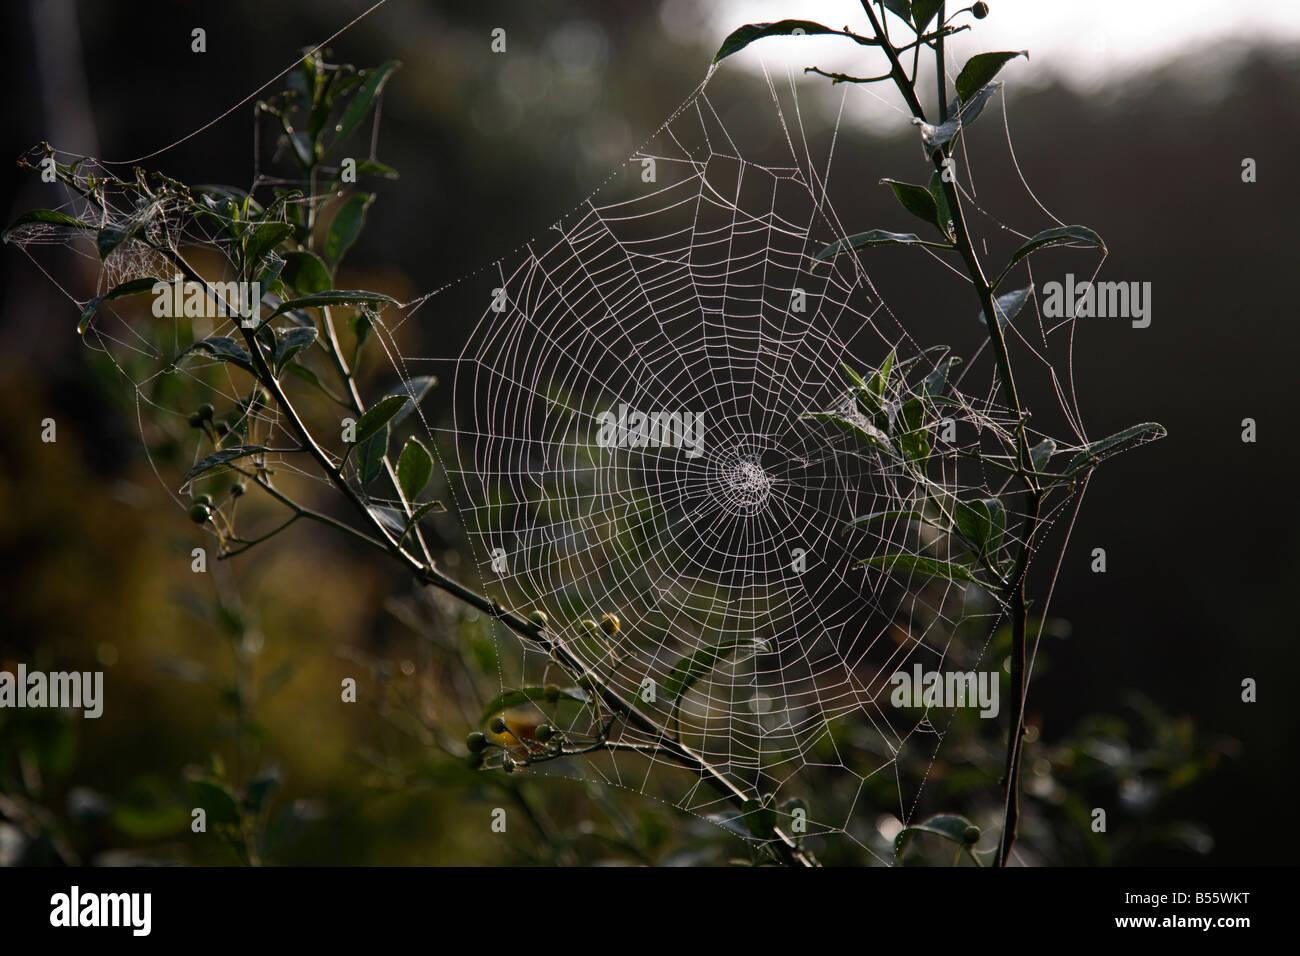 Spiders Webs Misty Autumn - Stock Image